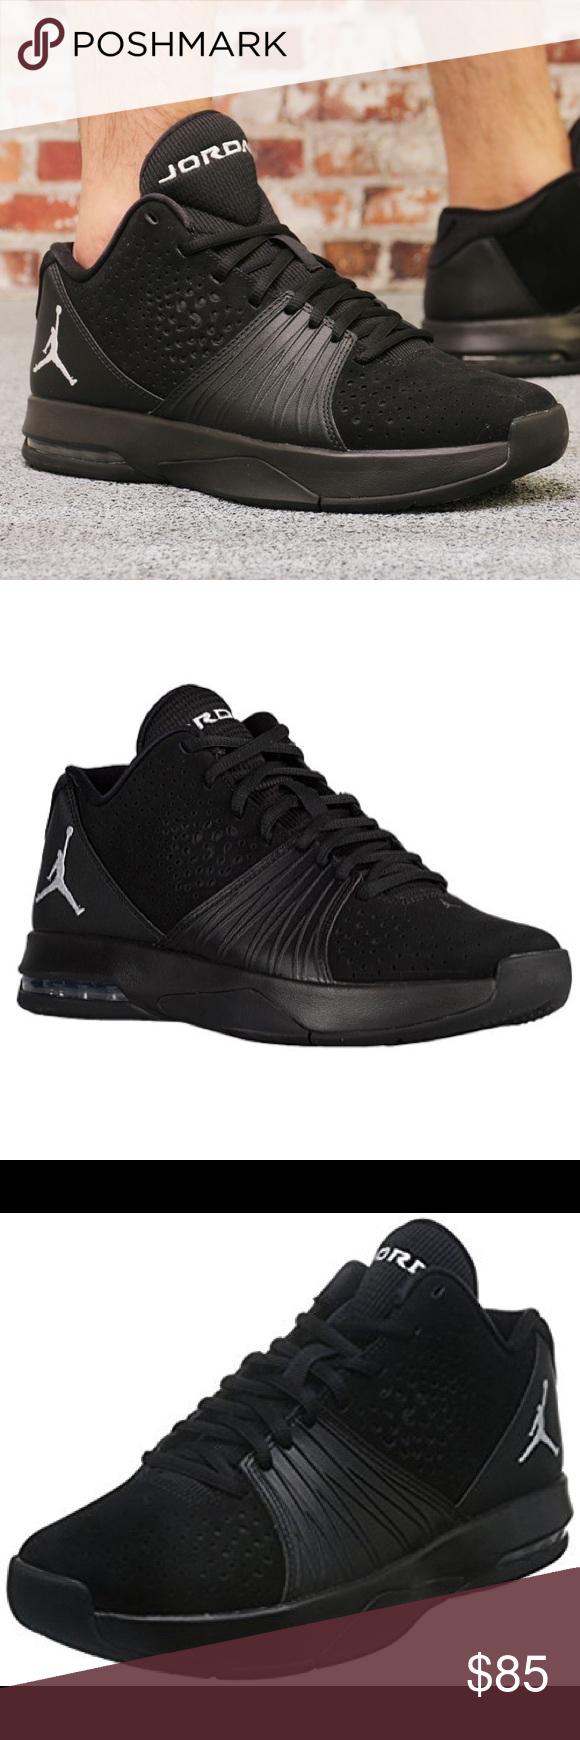 2957425e633 Nike Air Jordan Black Flight Special Edition 30 yr NWT